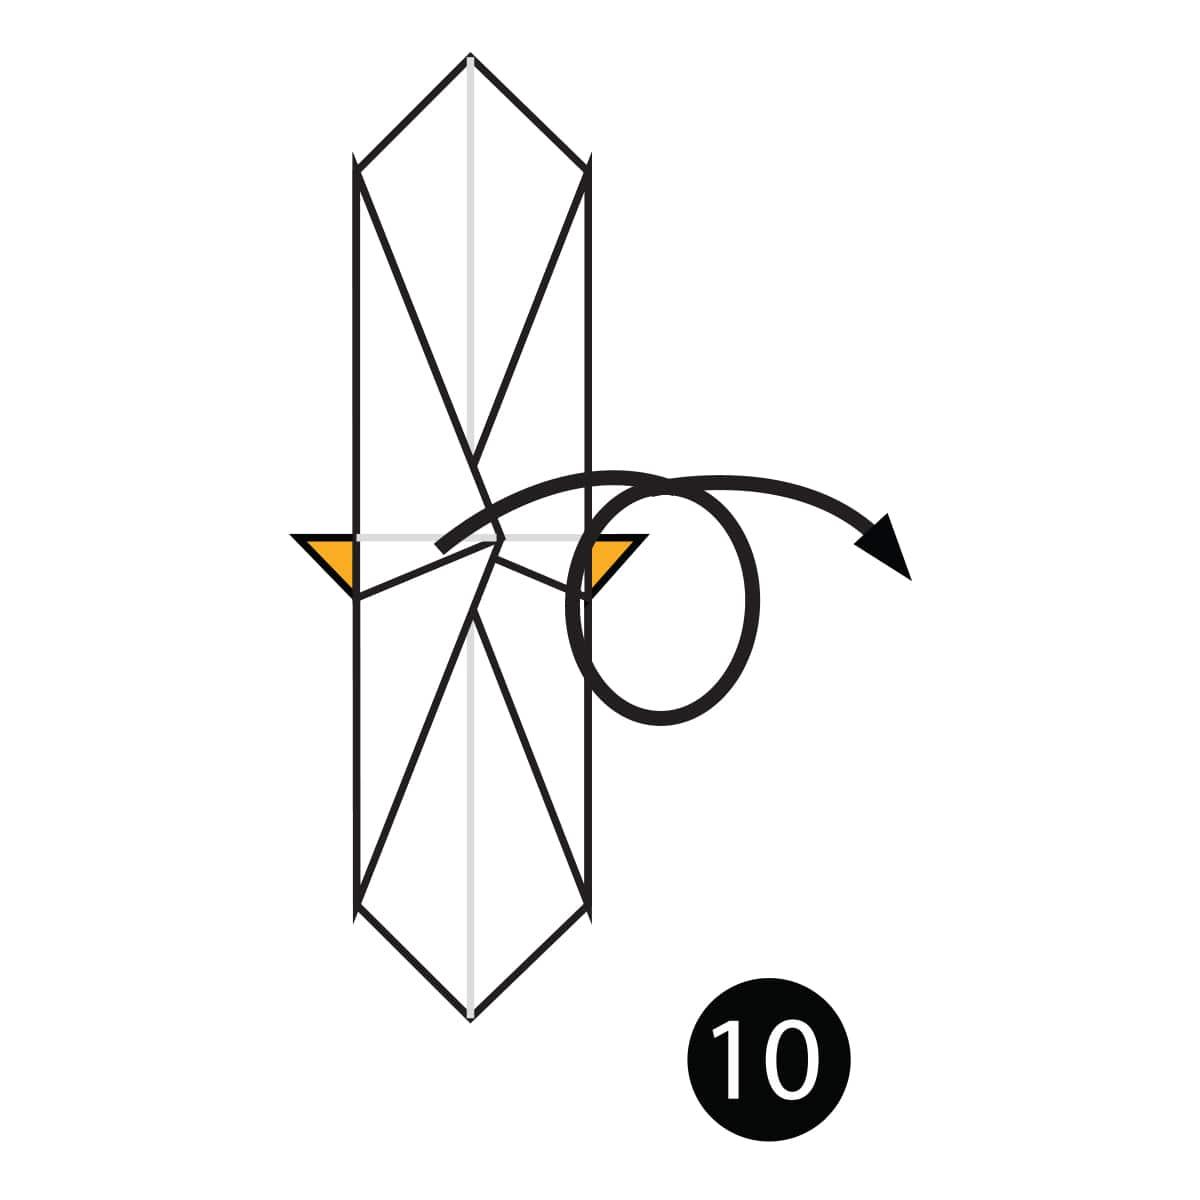 Dachshund Step 10